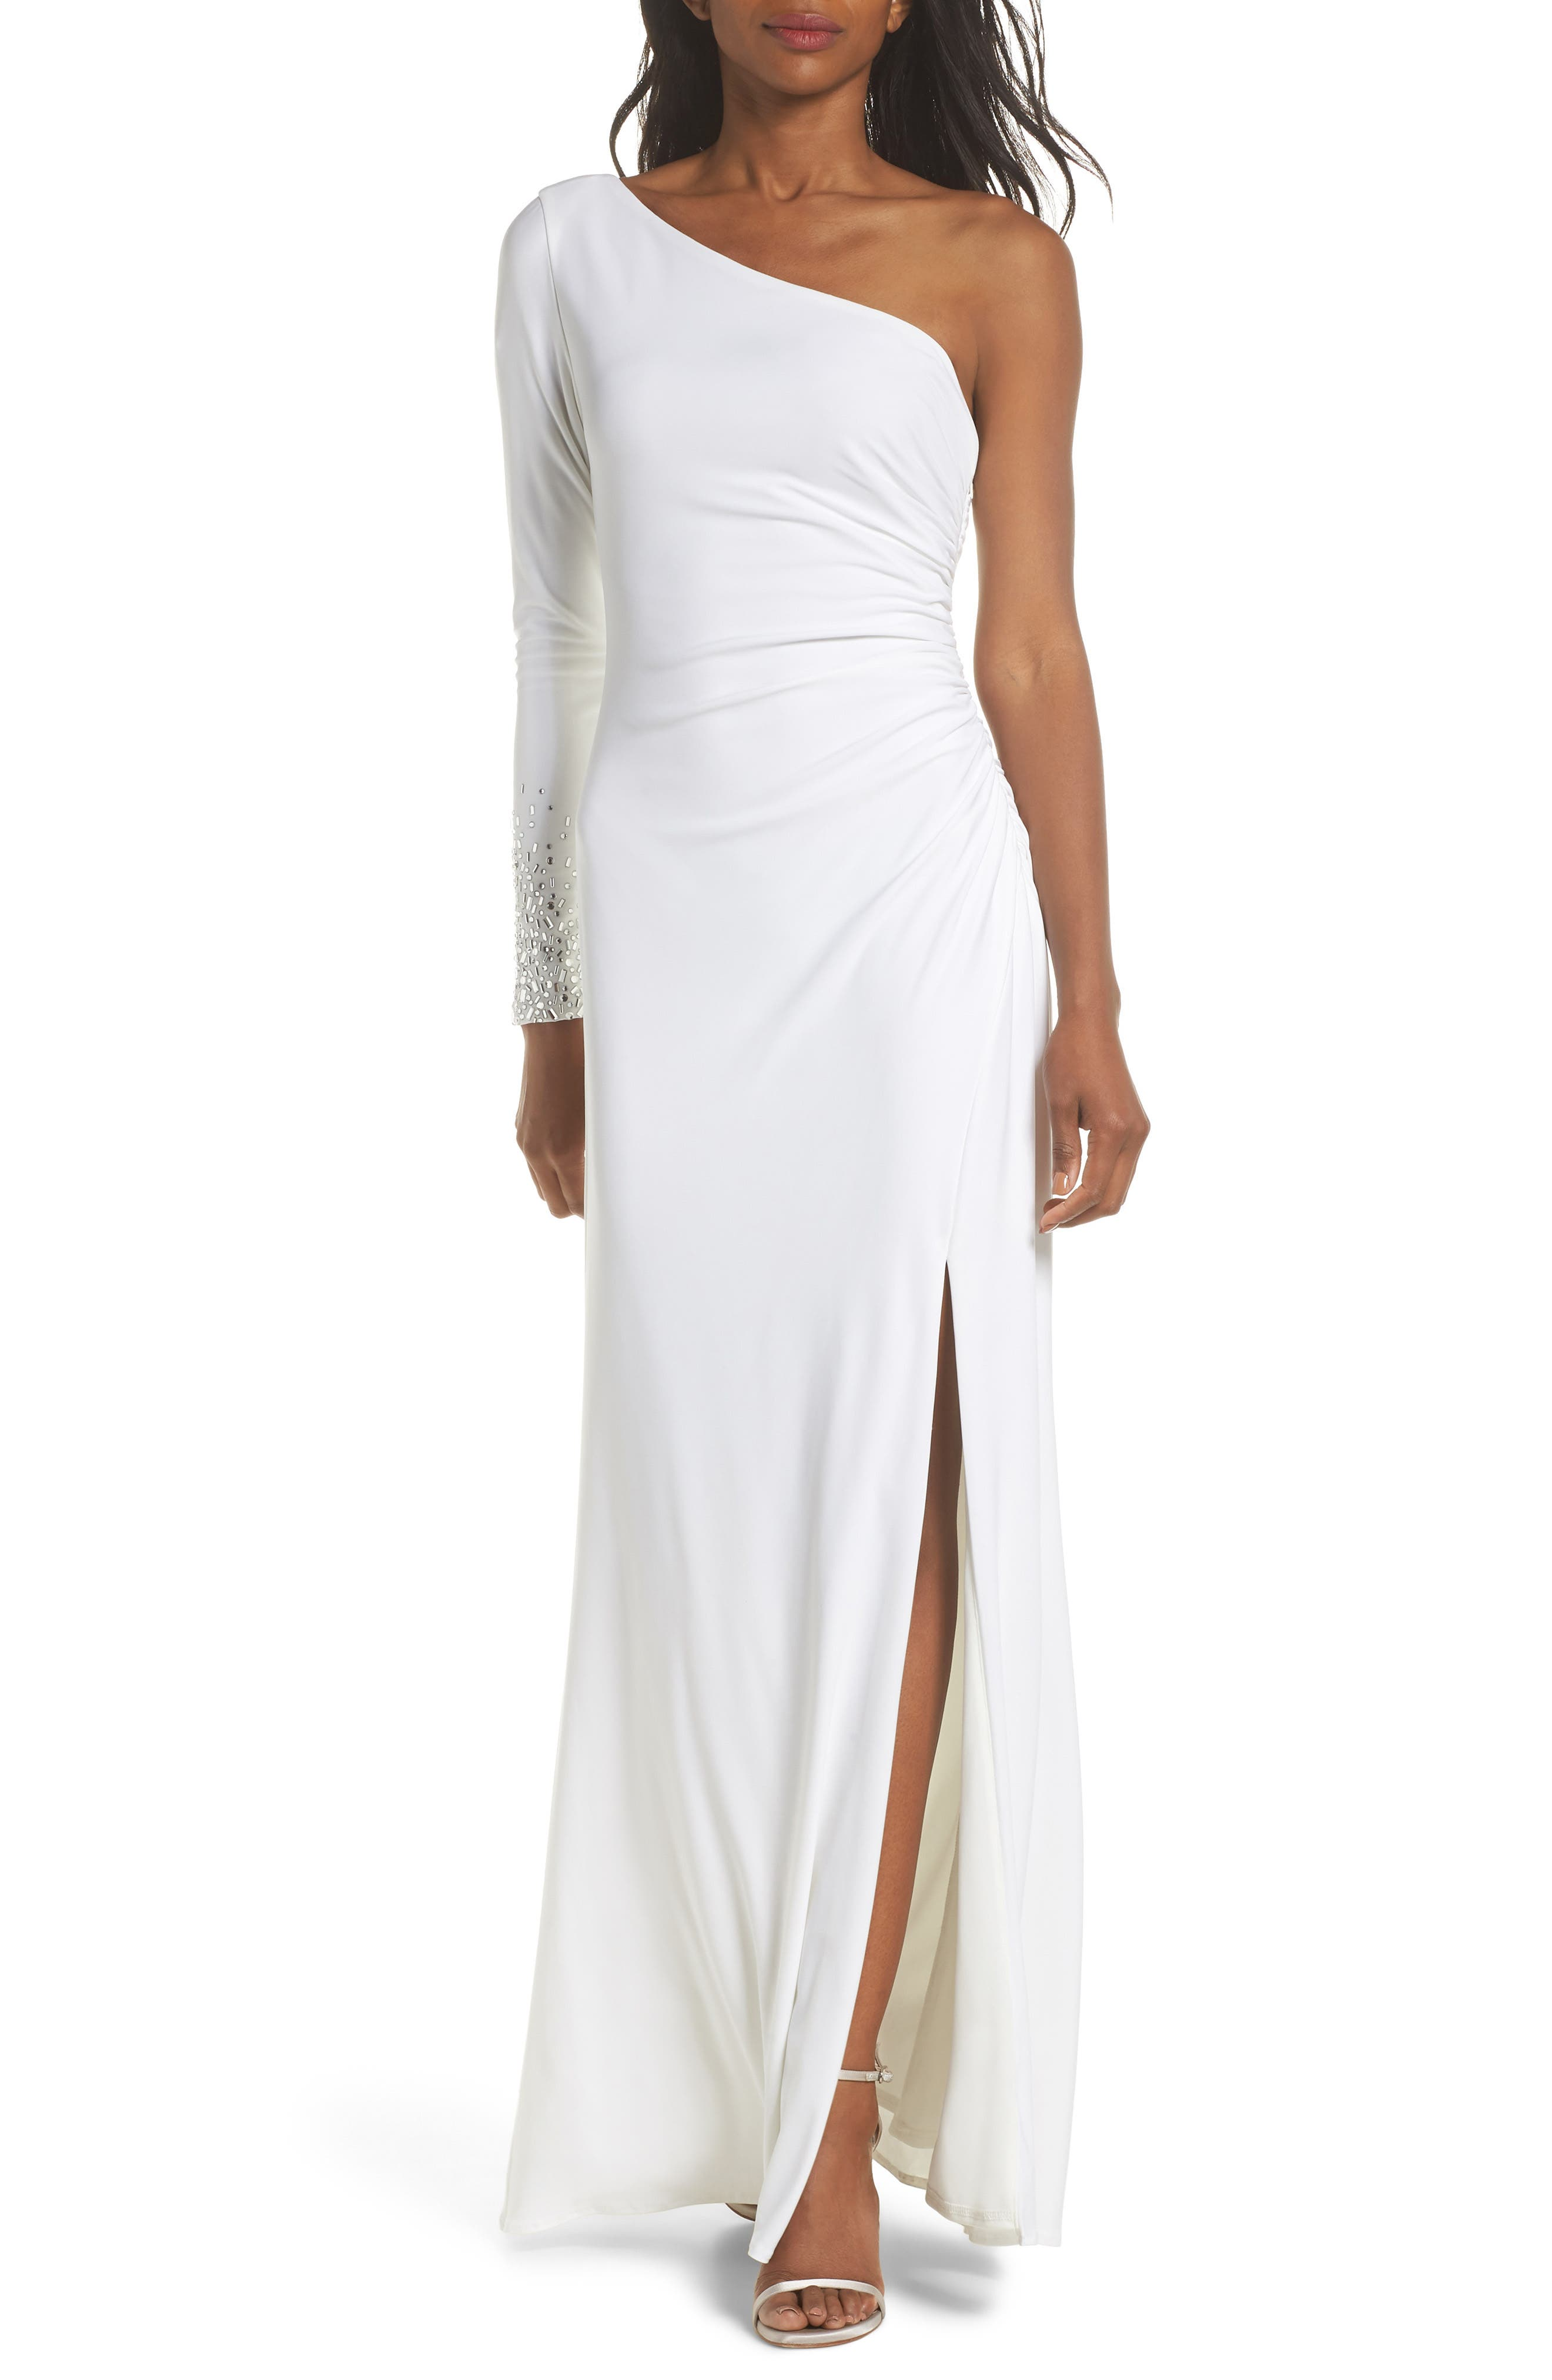 White Flowy One Shoulder Dress